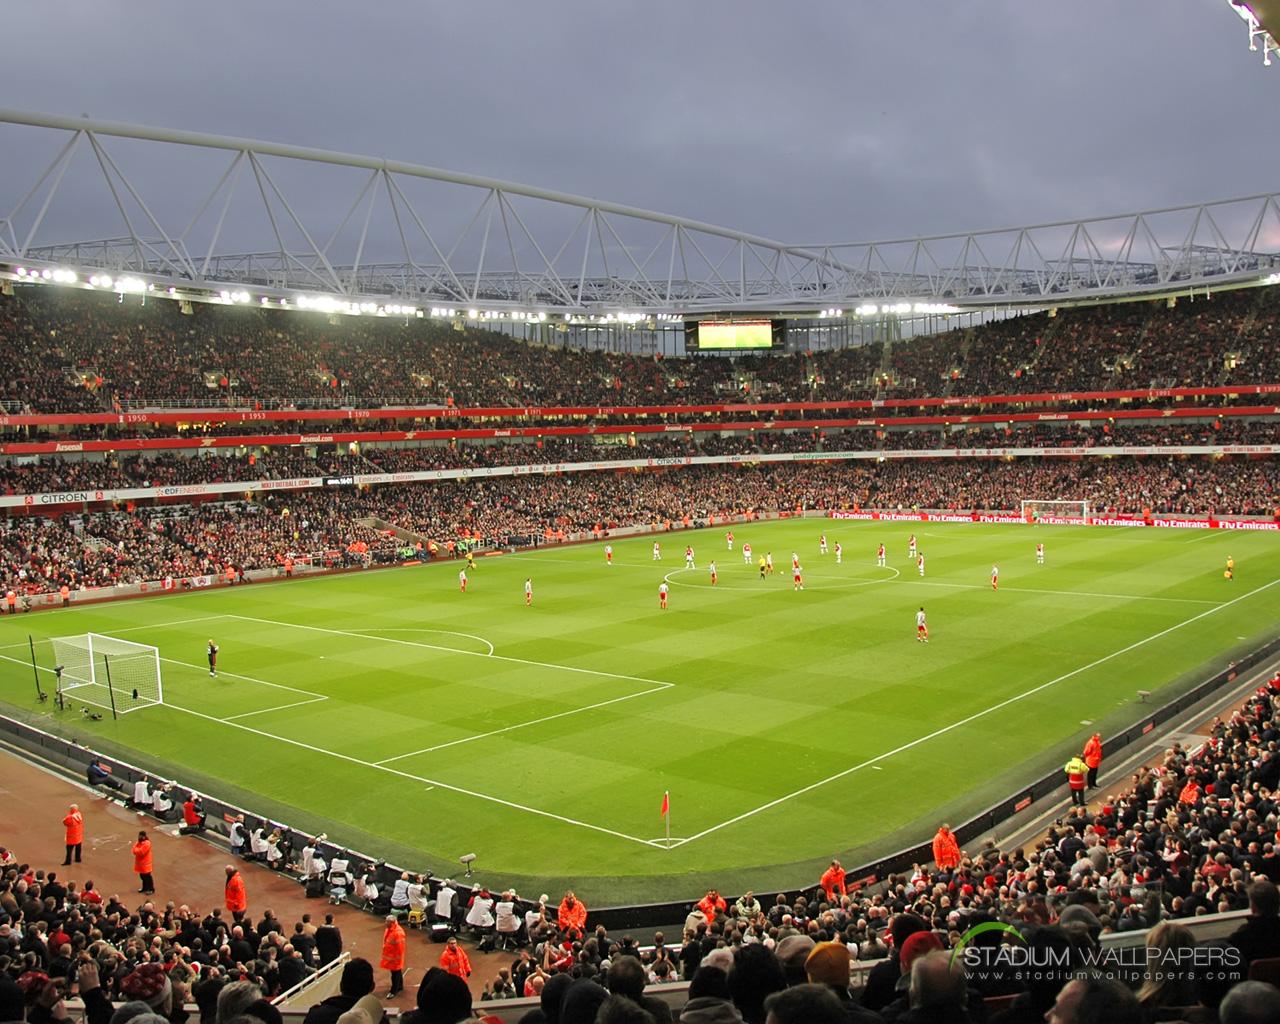 Awesome Emirates Stadium wallpaper Stadium wallpapers 1280x1024